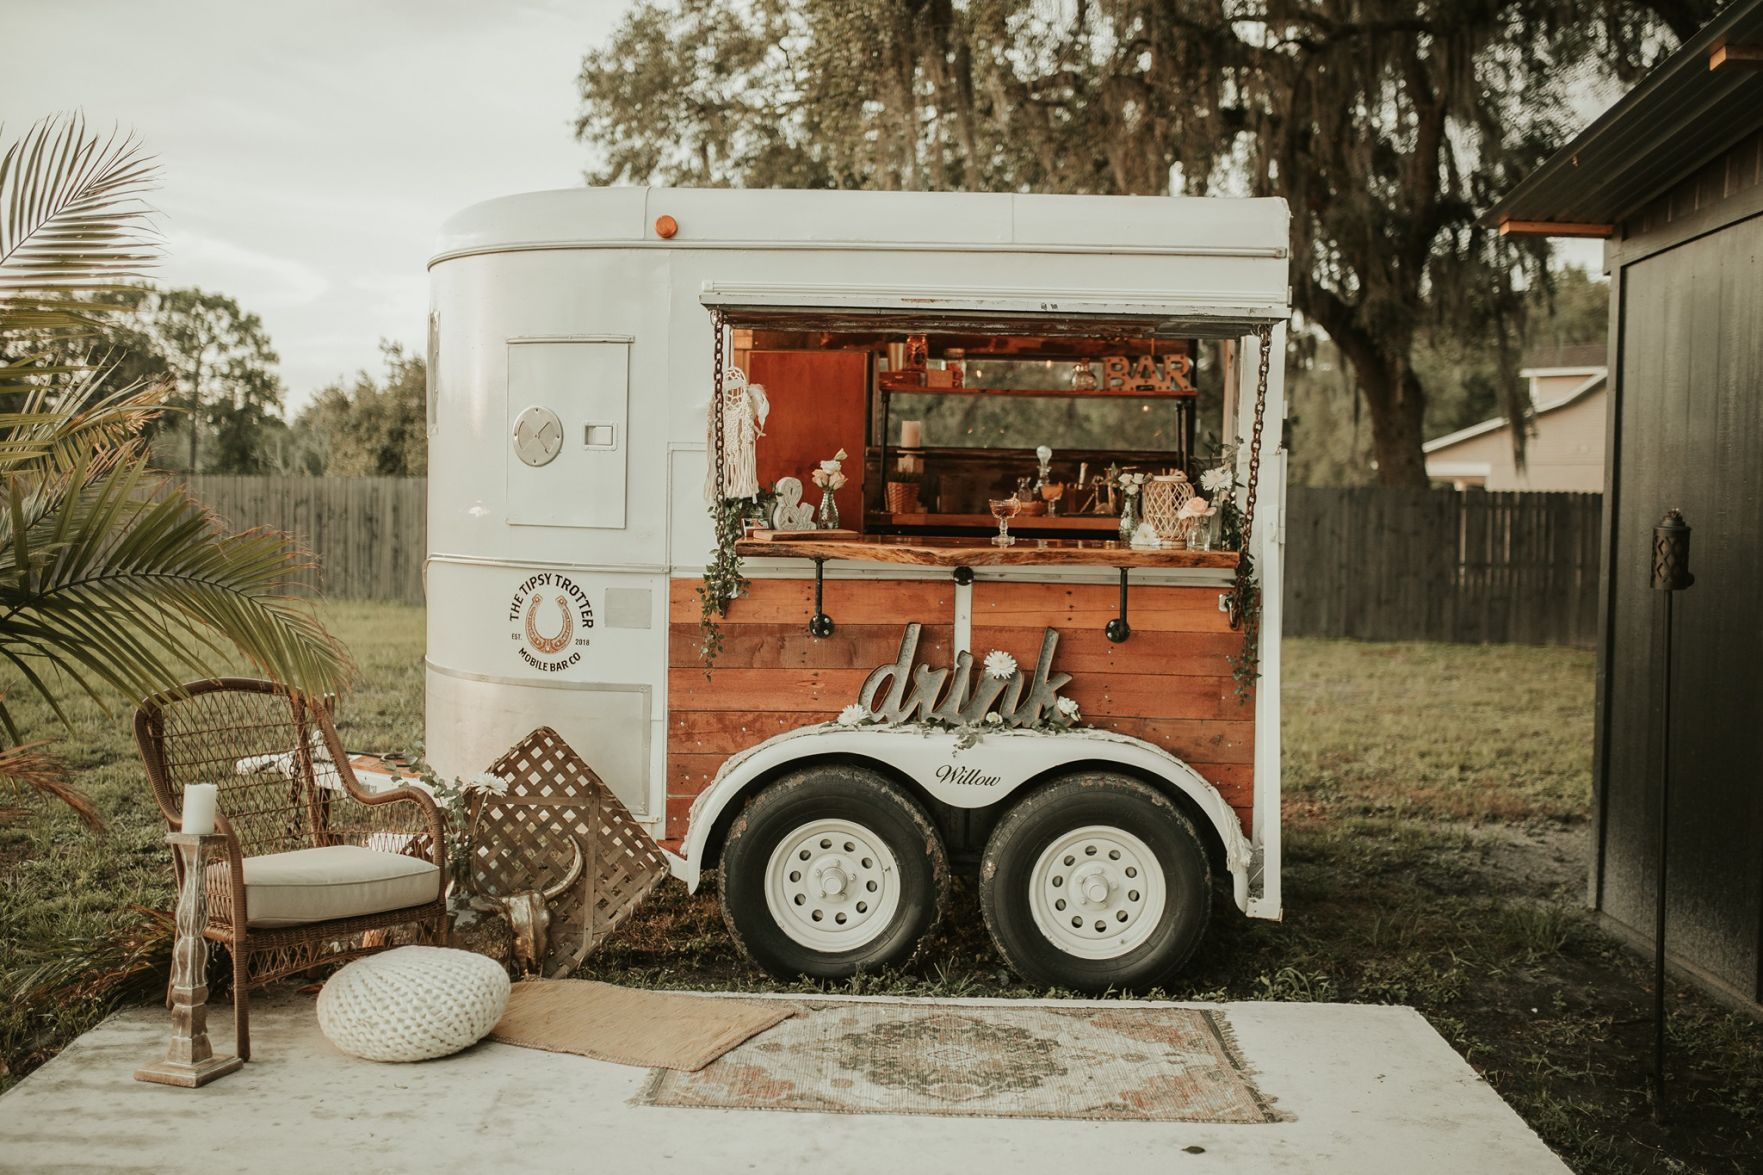 Seminole Entrepreneur Turns An Old Horse Trailer Into A Mobile Bar Seminole Tbnweekly Com